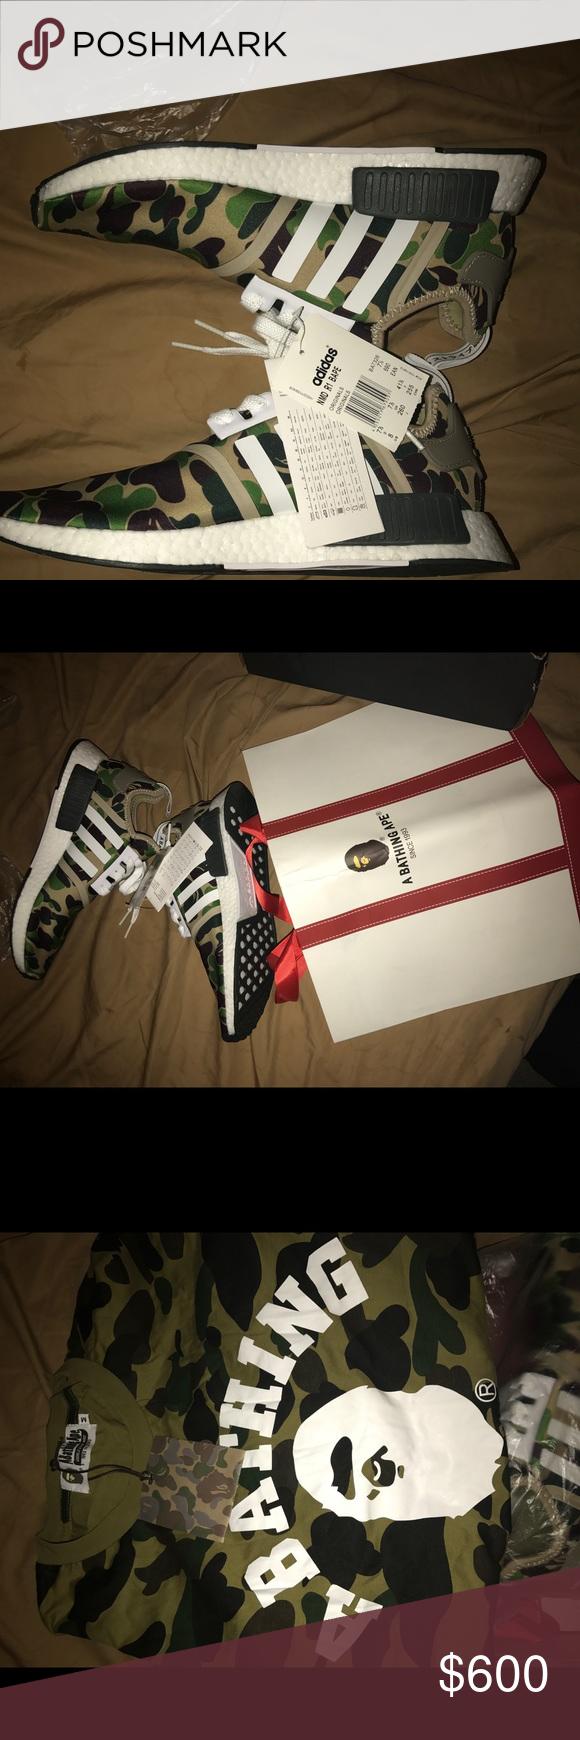 52b9da225 Spotted while shopping on Poshmark  NIB BAPE x Adidas Originals NMD R1  Green Camo!  poshmark  fashion  shopping  style  adidas  Other